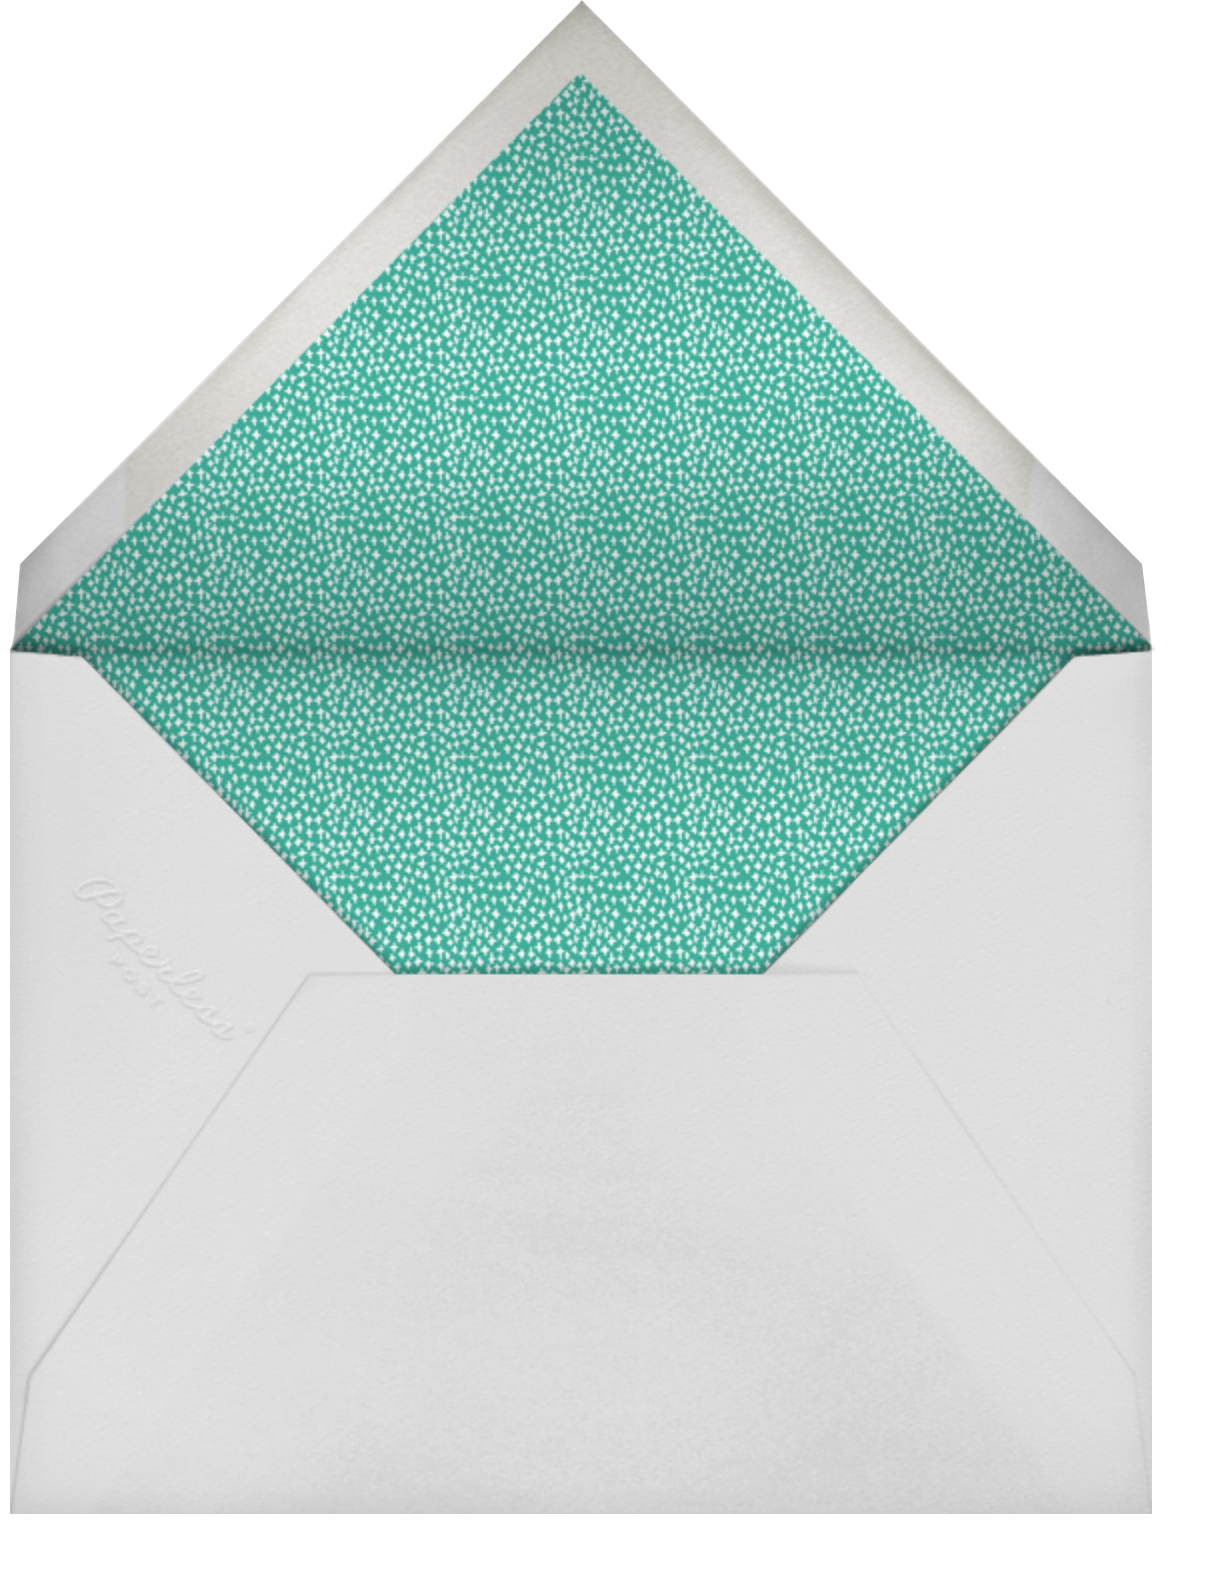 Neck and Neck - Mr. Boddington's Studio - Envelope